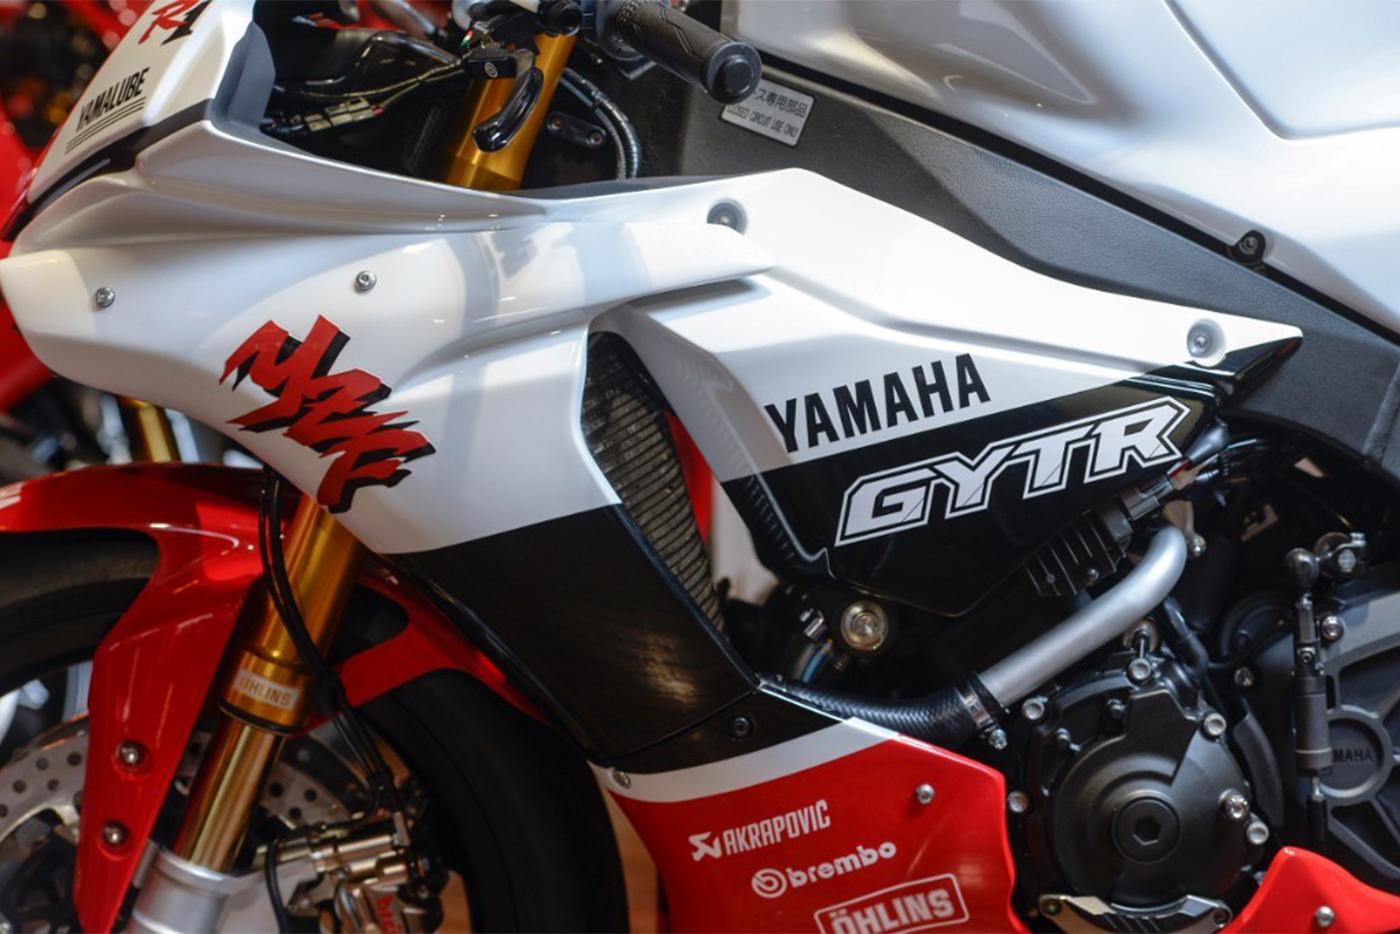 yamaha-yzf-r1-gytr-15.jpg